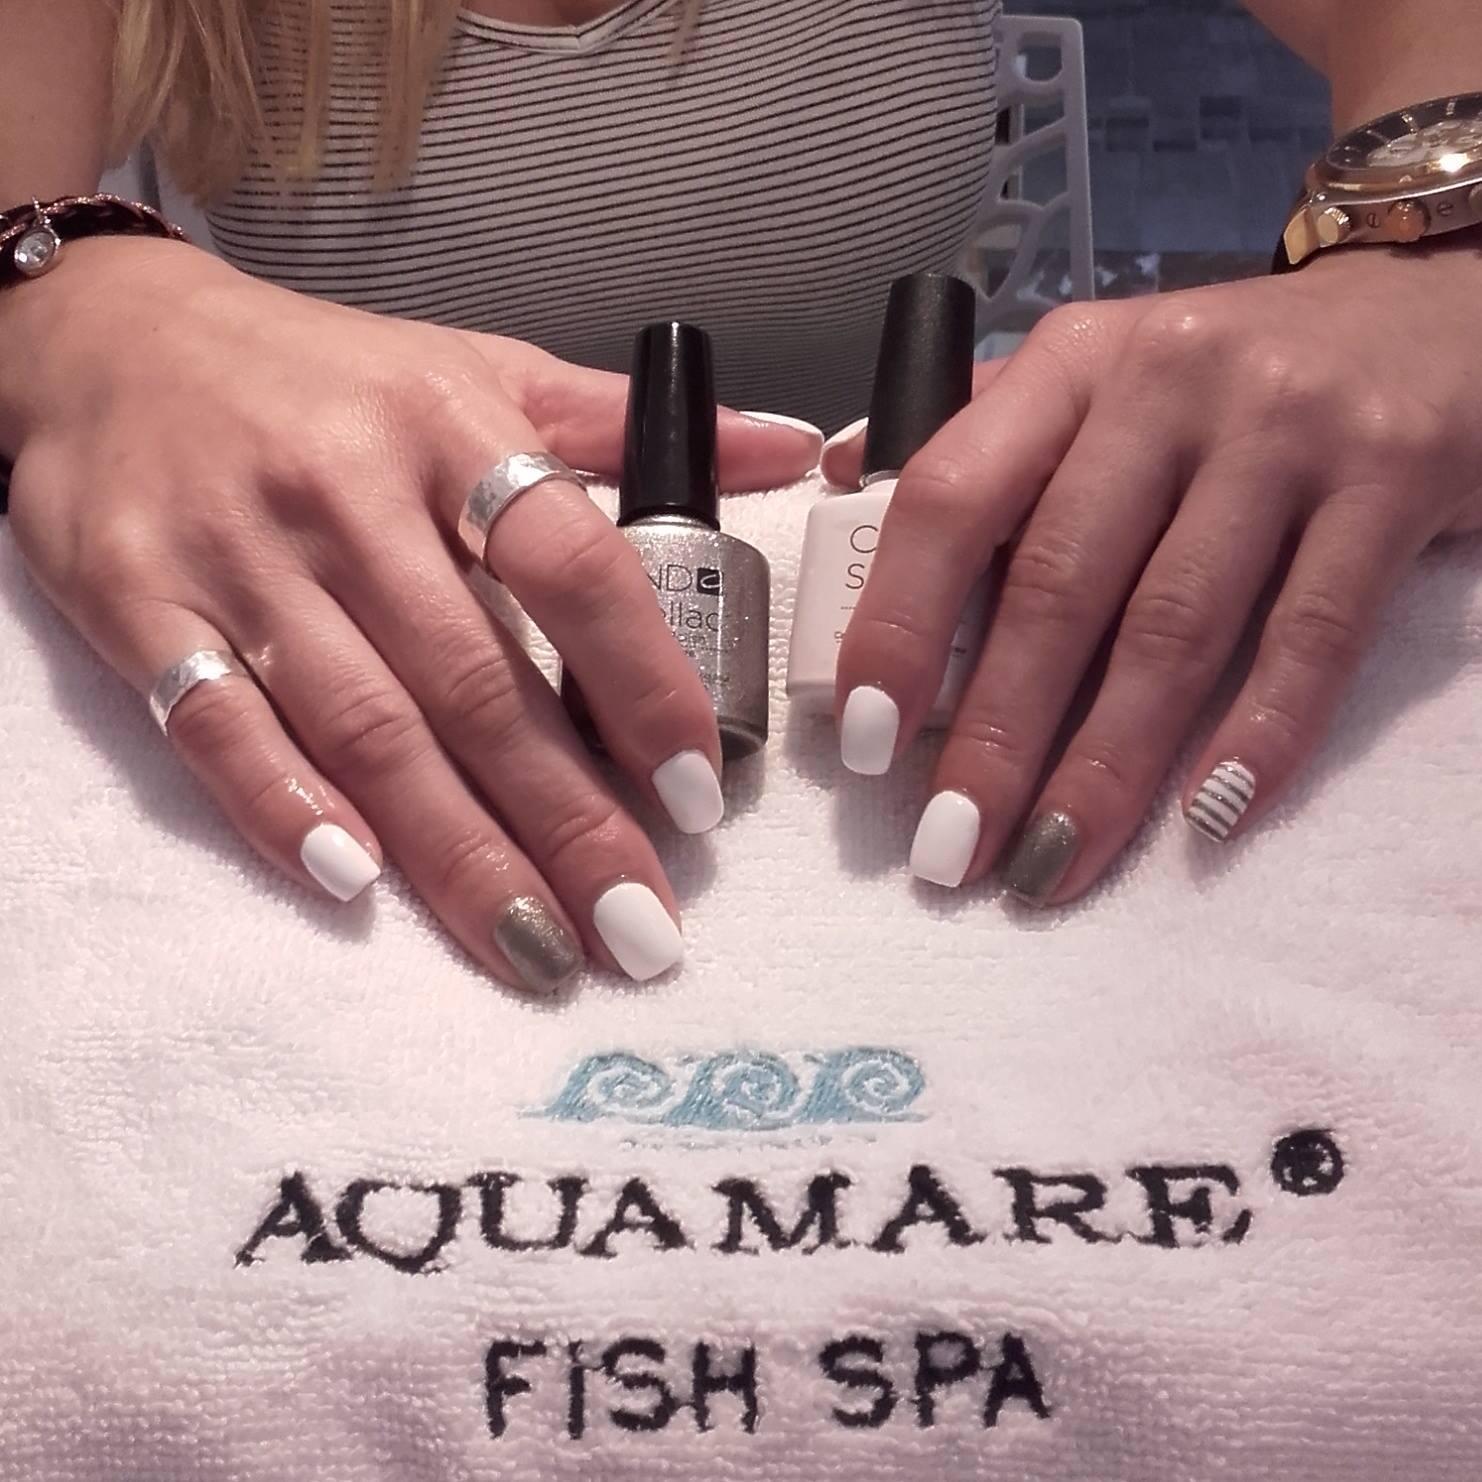 Aqua Mare Fish Spa